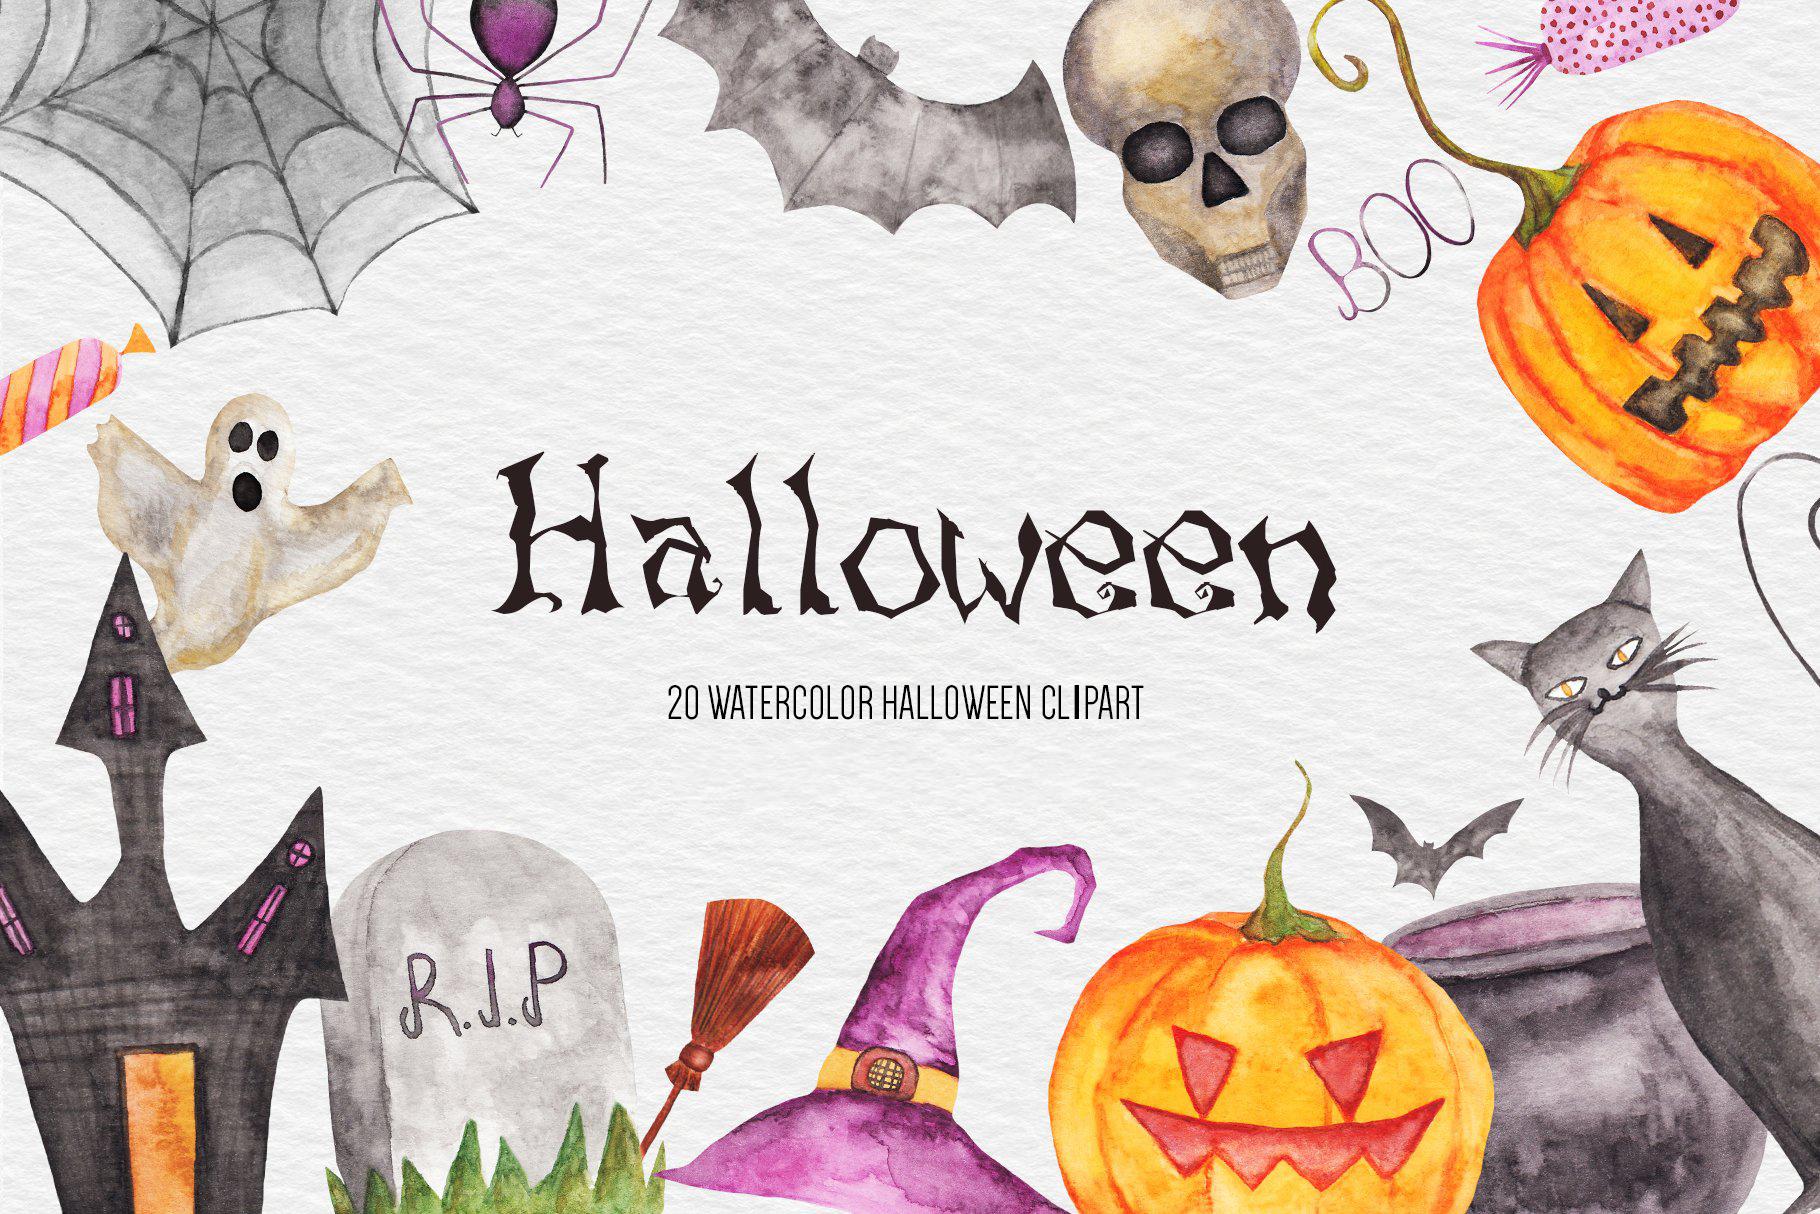 Watercolor Halloween Clipart, Pumpkin, Fall Autumn Clipart example image 1